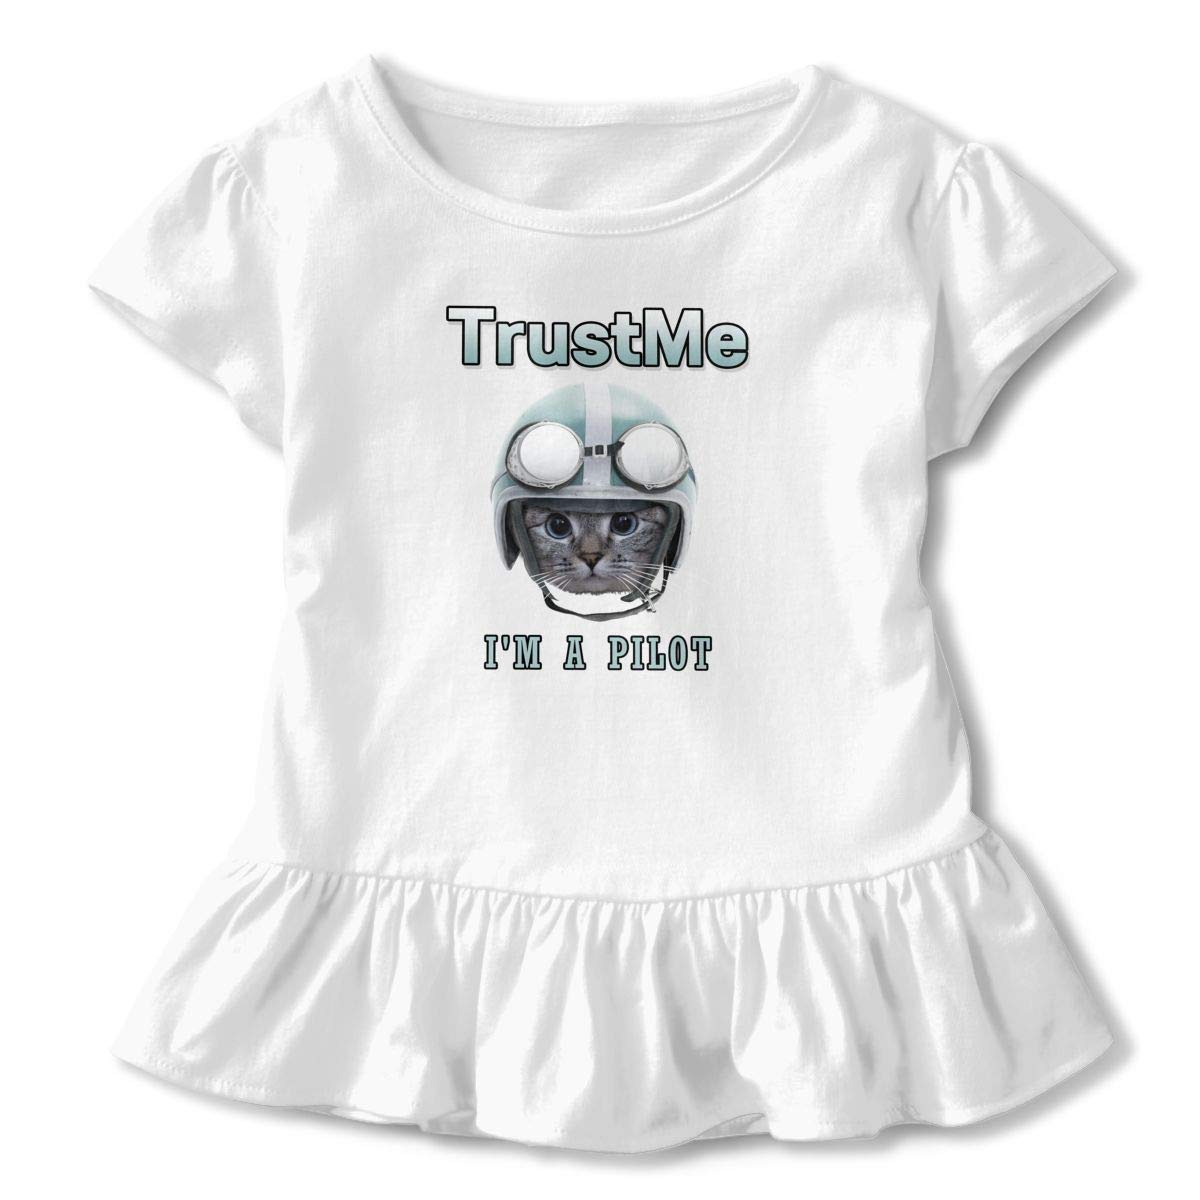 Trust Me Im A Pilot Toddler Baby Girls Cotton Ruffle Short Sleeve Top Comfortable T-Shirt 2-6T